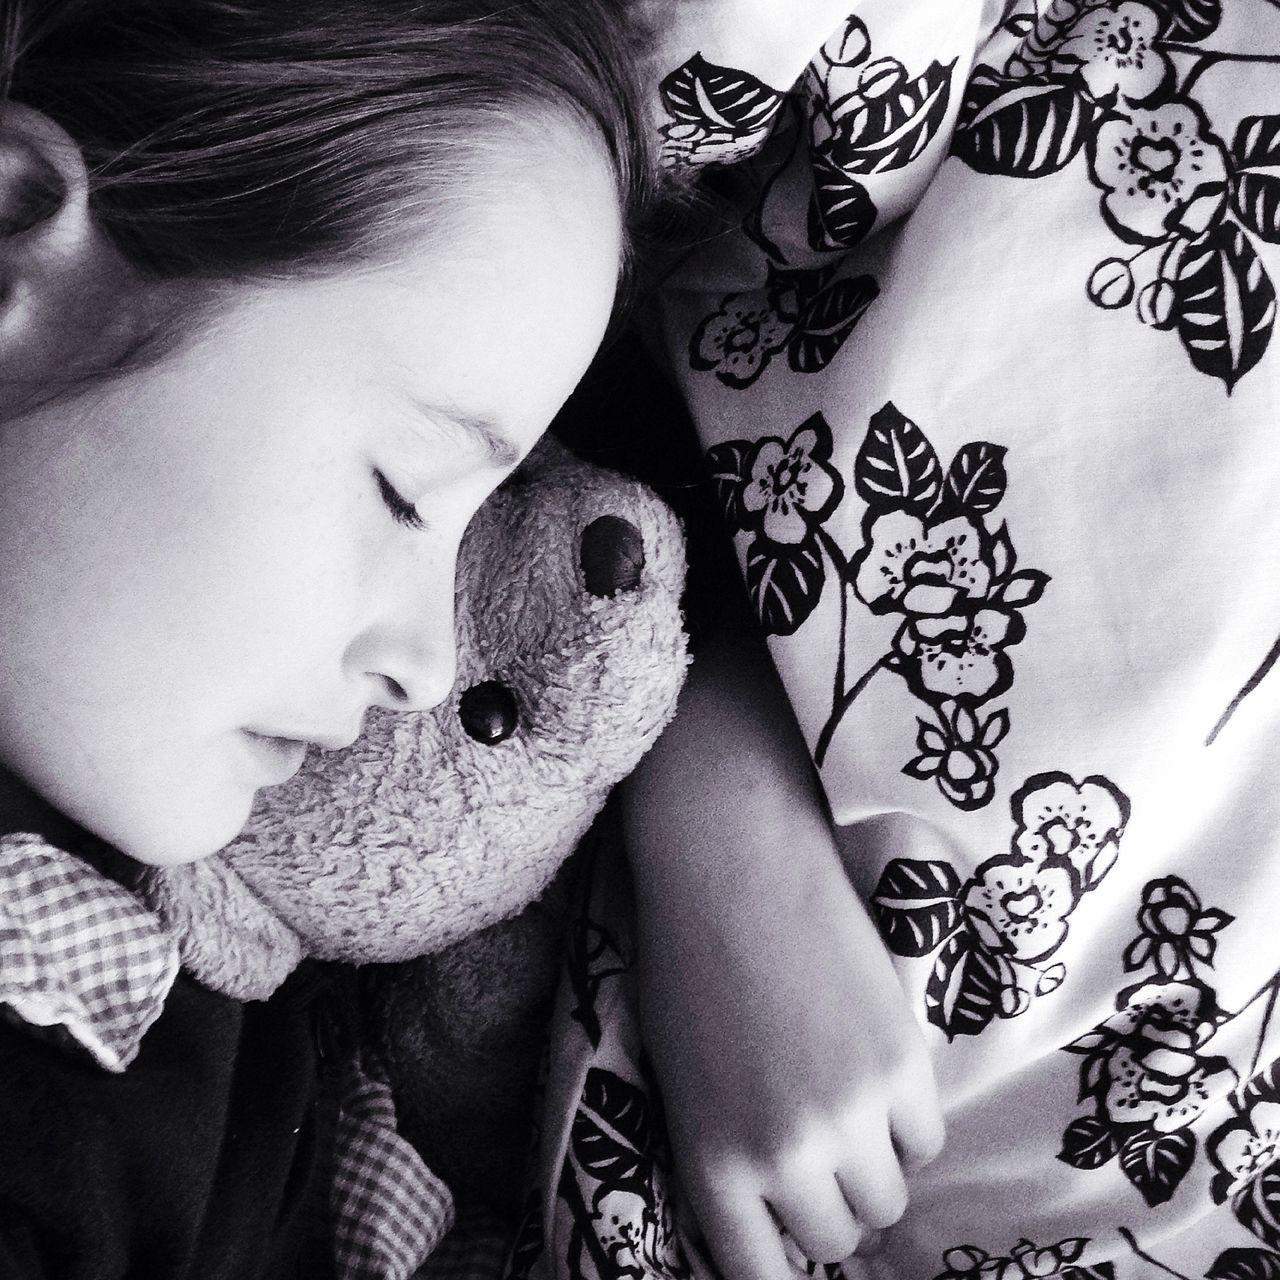 Nap time Nap Child Sleeping Child Black And White Black & White Teddy Teddy Bear Girl And Teddy Cuddle Hug Dream Portrait Of A Child Portrait Sleep